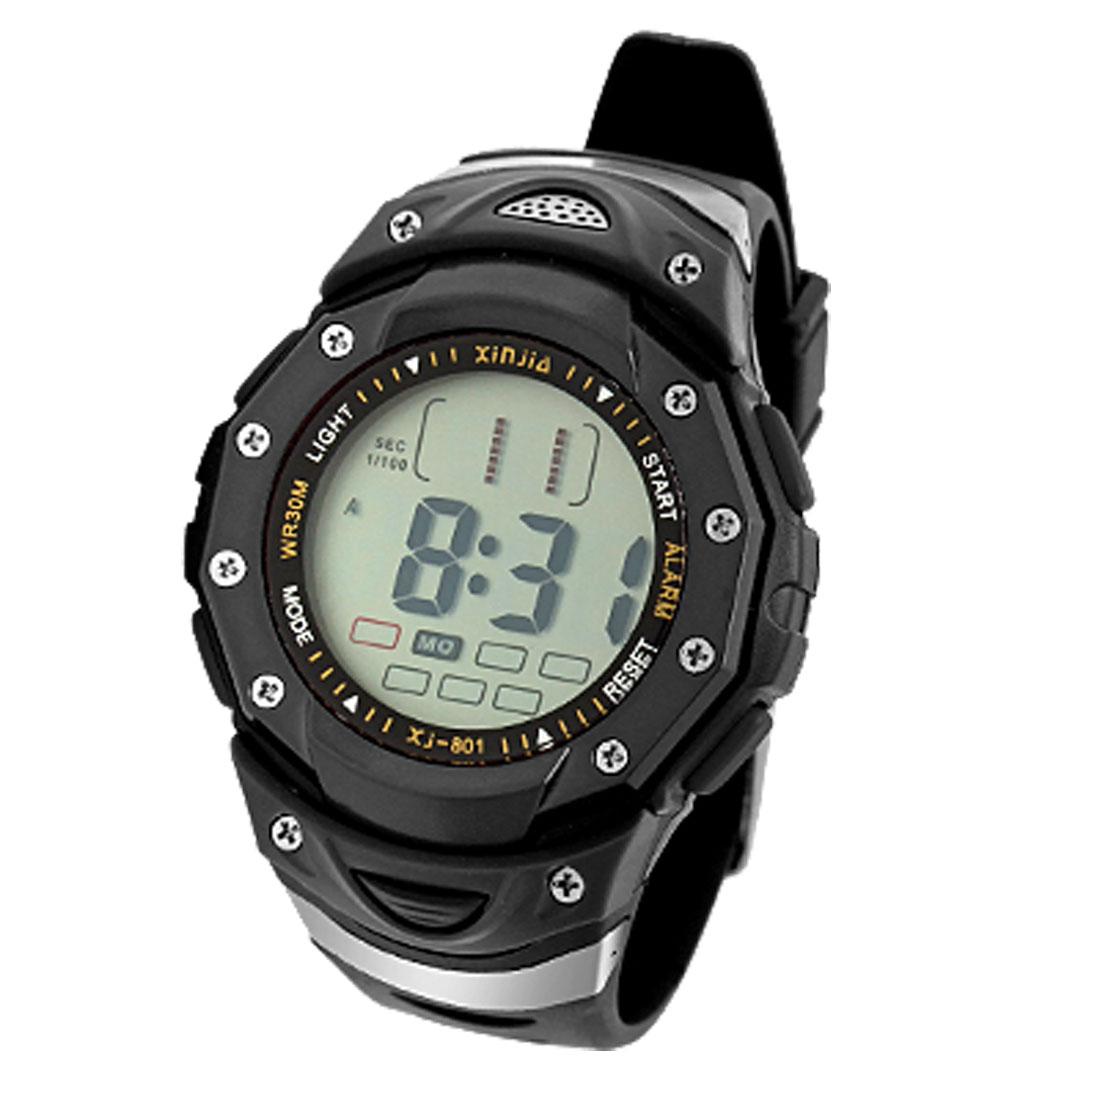 Black Unisex Digital Multifunction Water Resistant Sports Watch